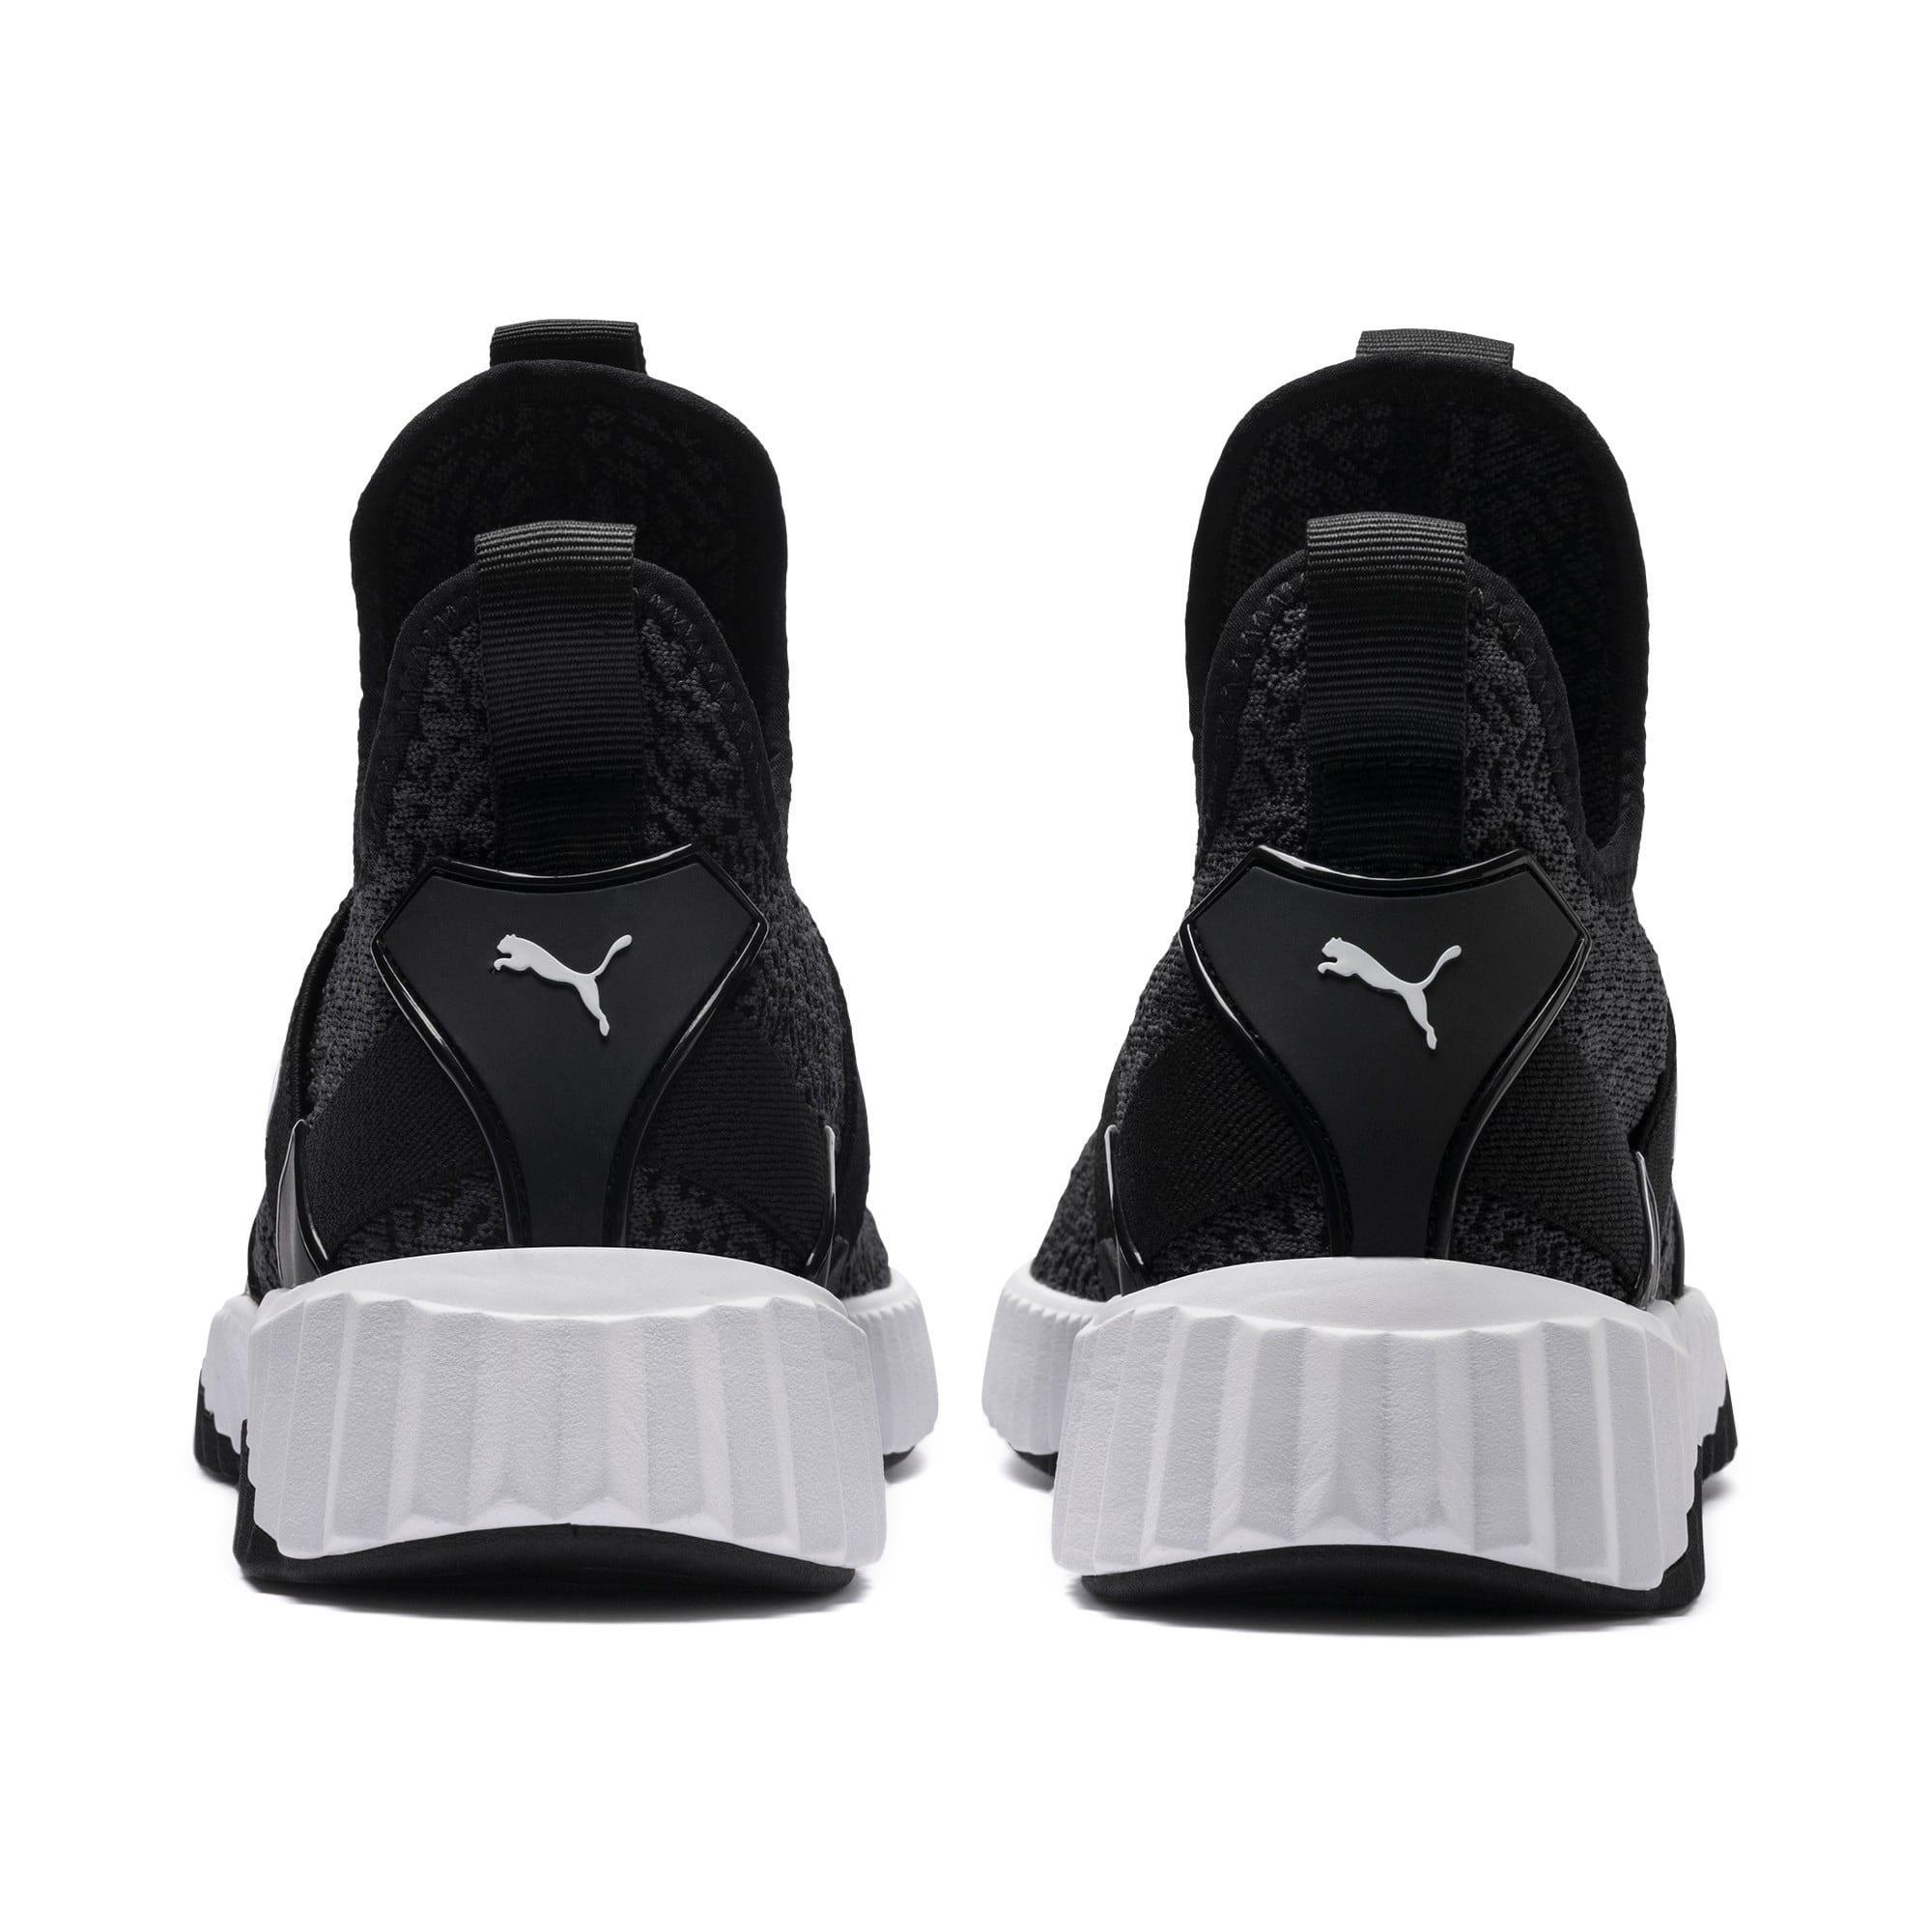 Thumbnail 4 of Defy Mid Animal Women's Training Shoes, Puma Black-Puma White, medium-IND